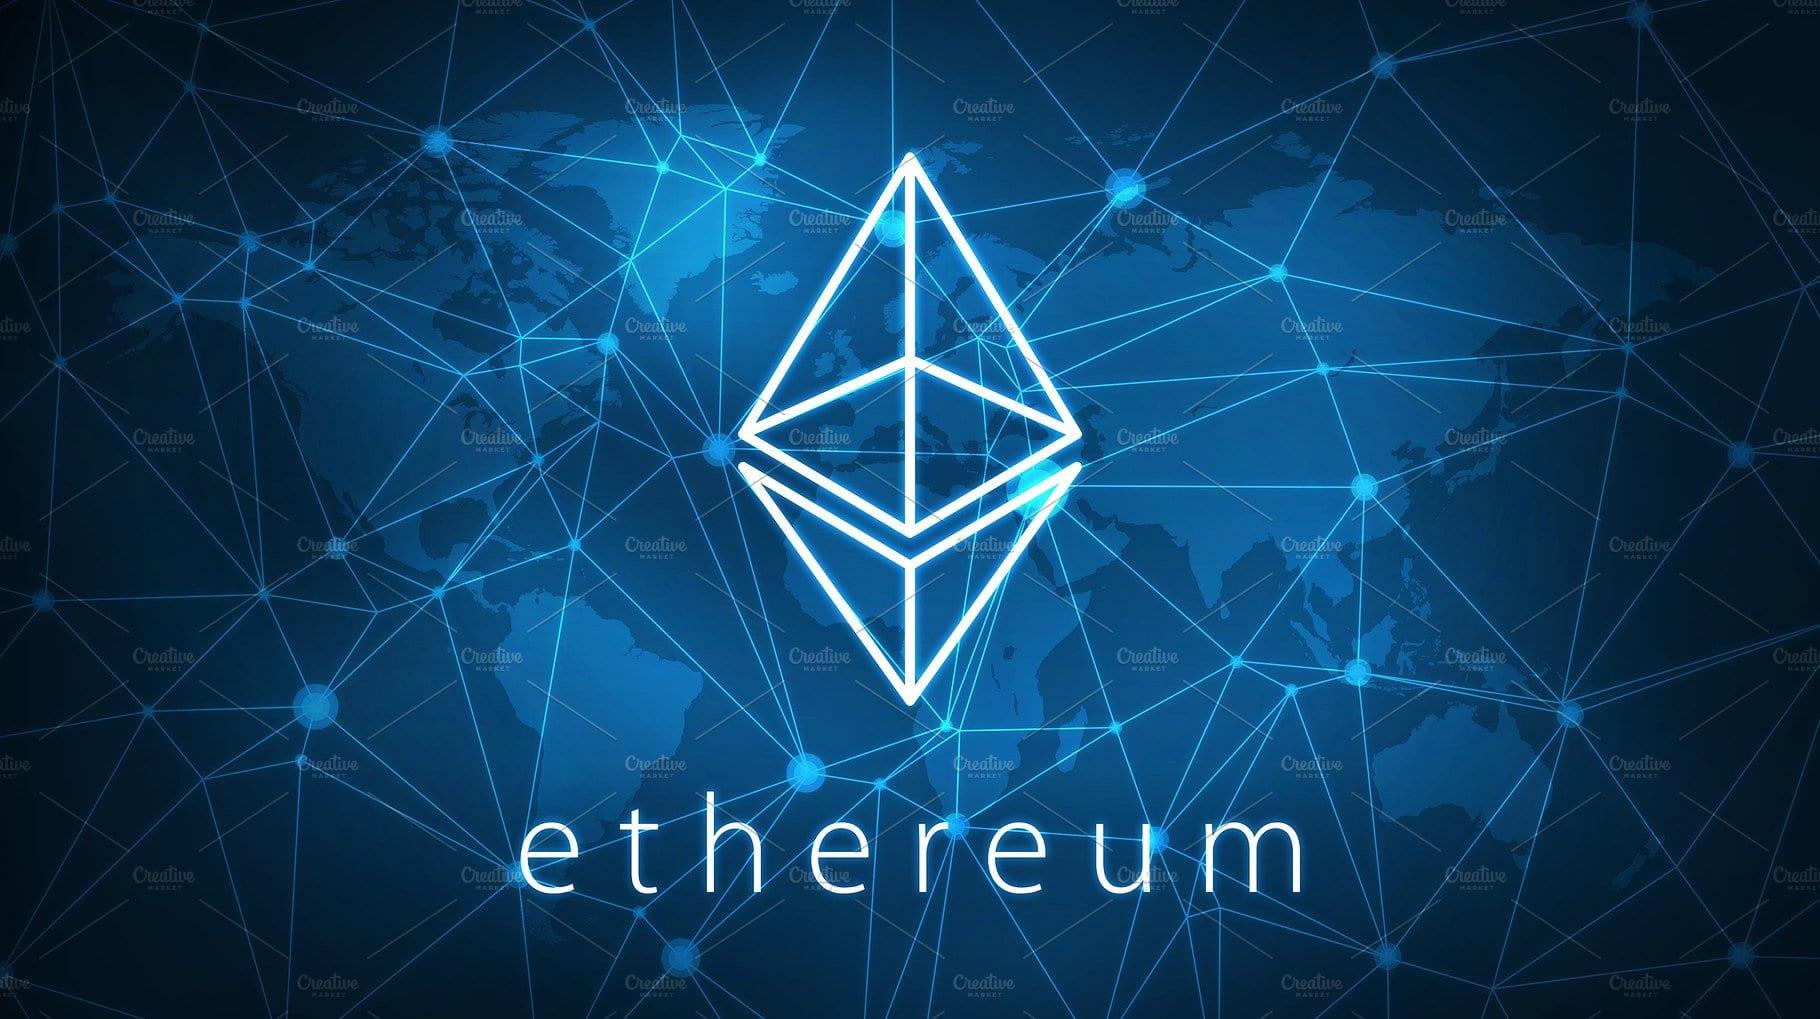 ce3ehnezwunldn7cuiddkwtrj3bh8qa65jrmxbi9vjhdbjorbchx21rsxij1ca7t  - Ethereum (ETH) Will Reportedly Lead The Next Bull Run